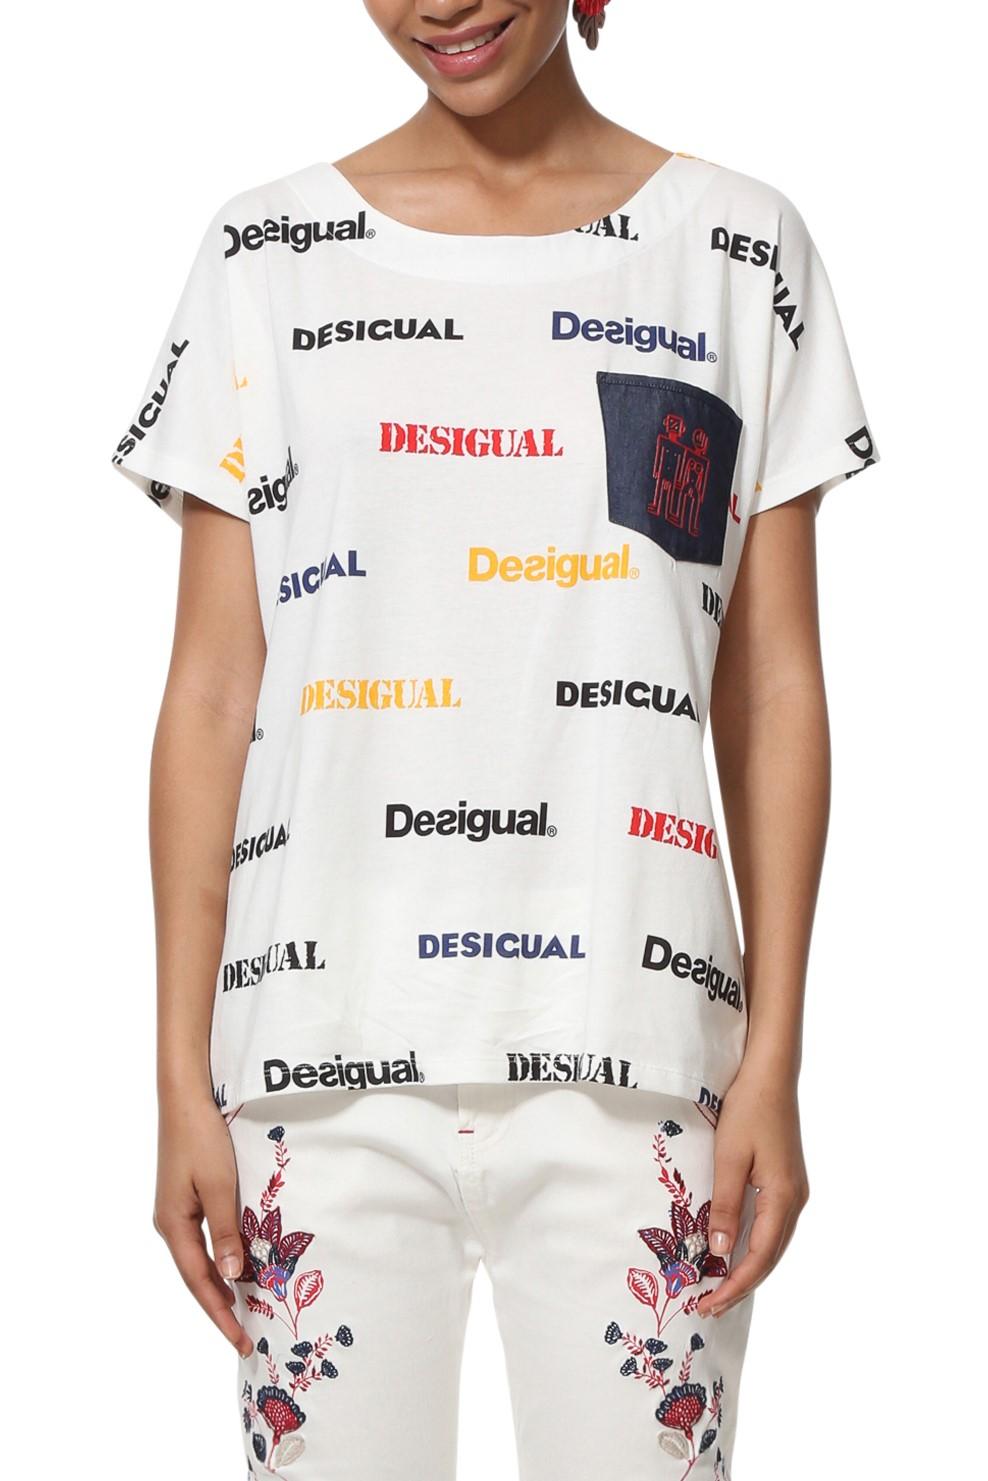 c66c8f7fb798 Desigual biele tričko TS Kendall s logom - Glami.sk